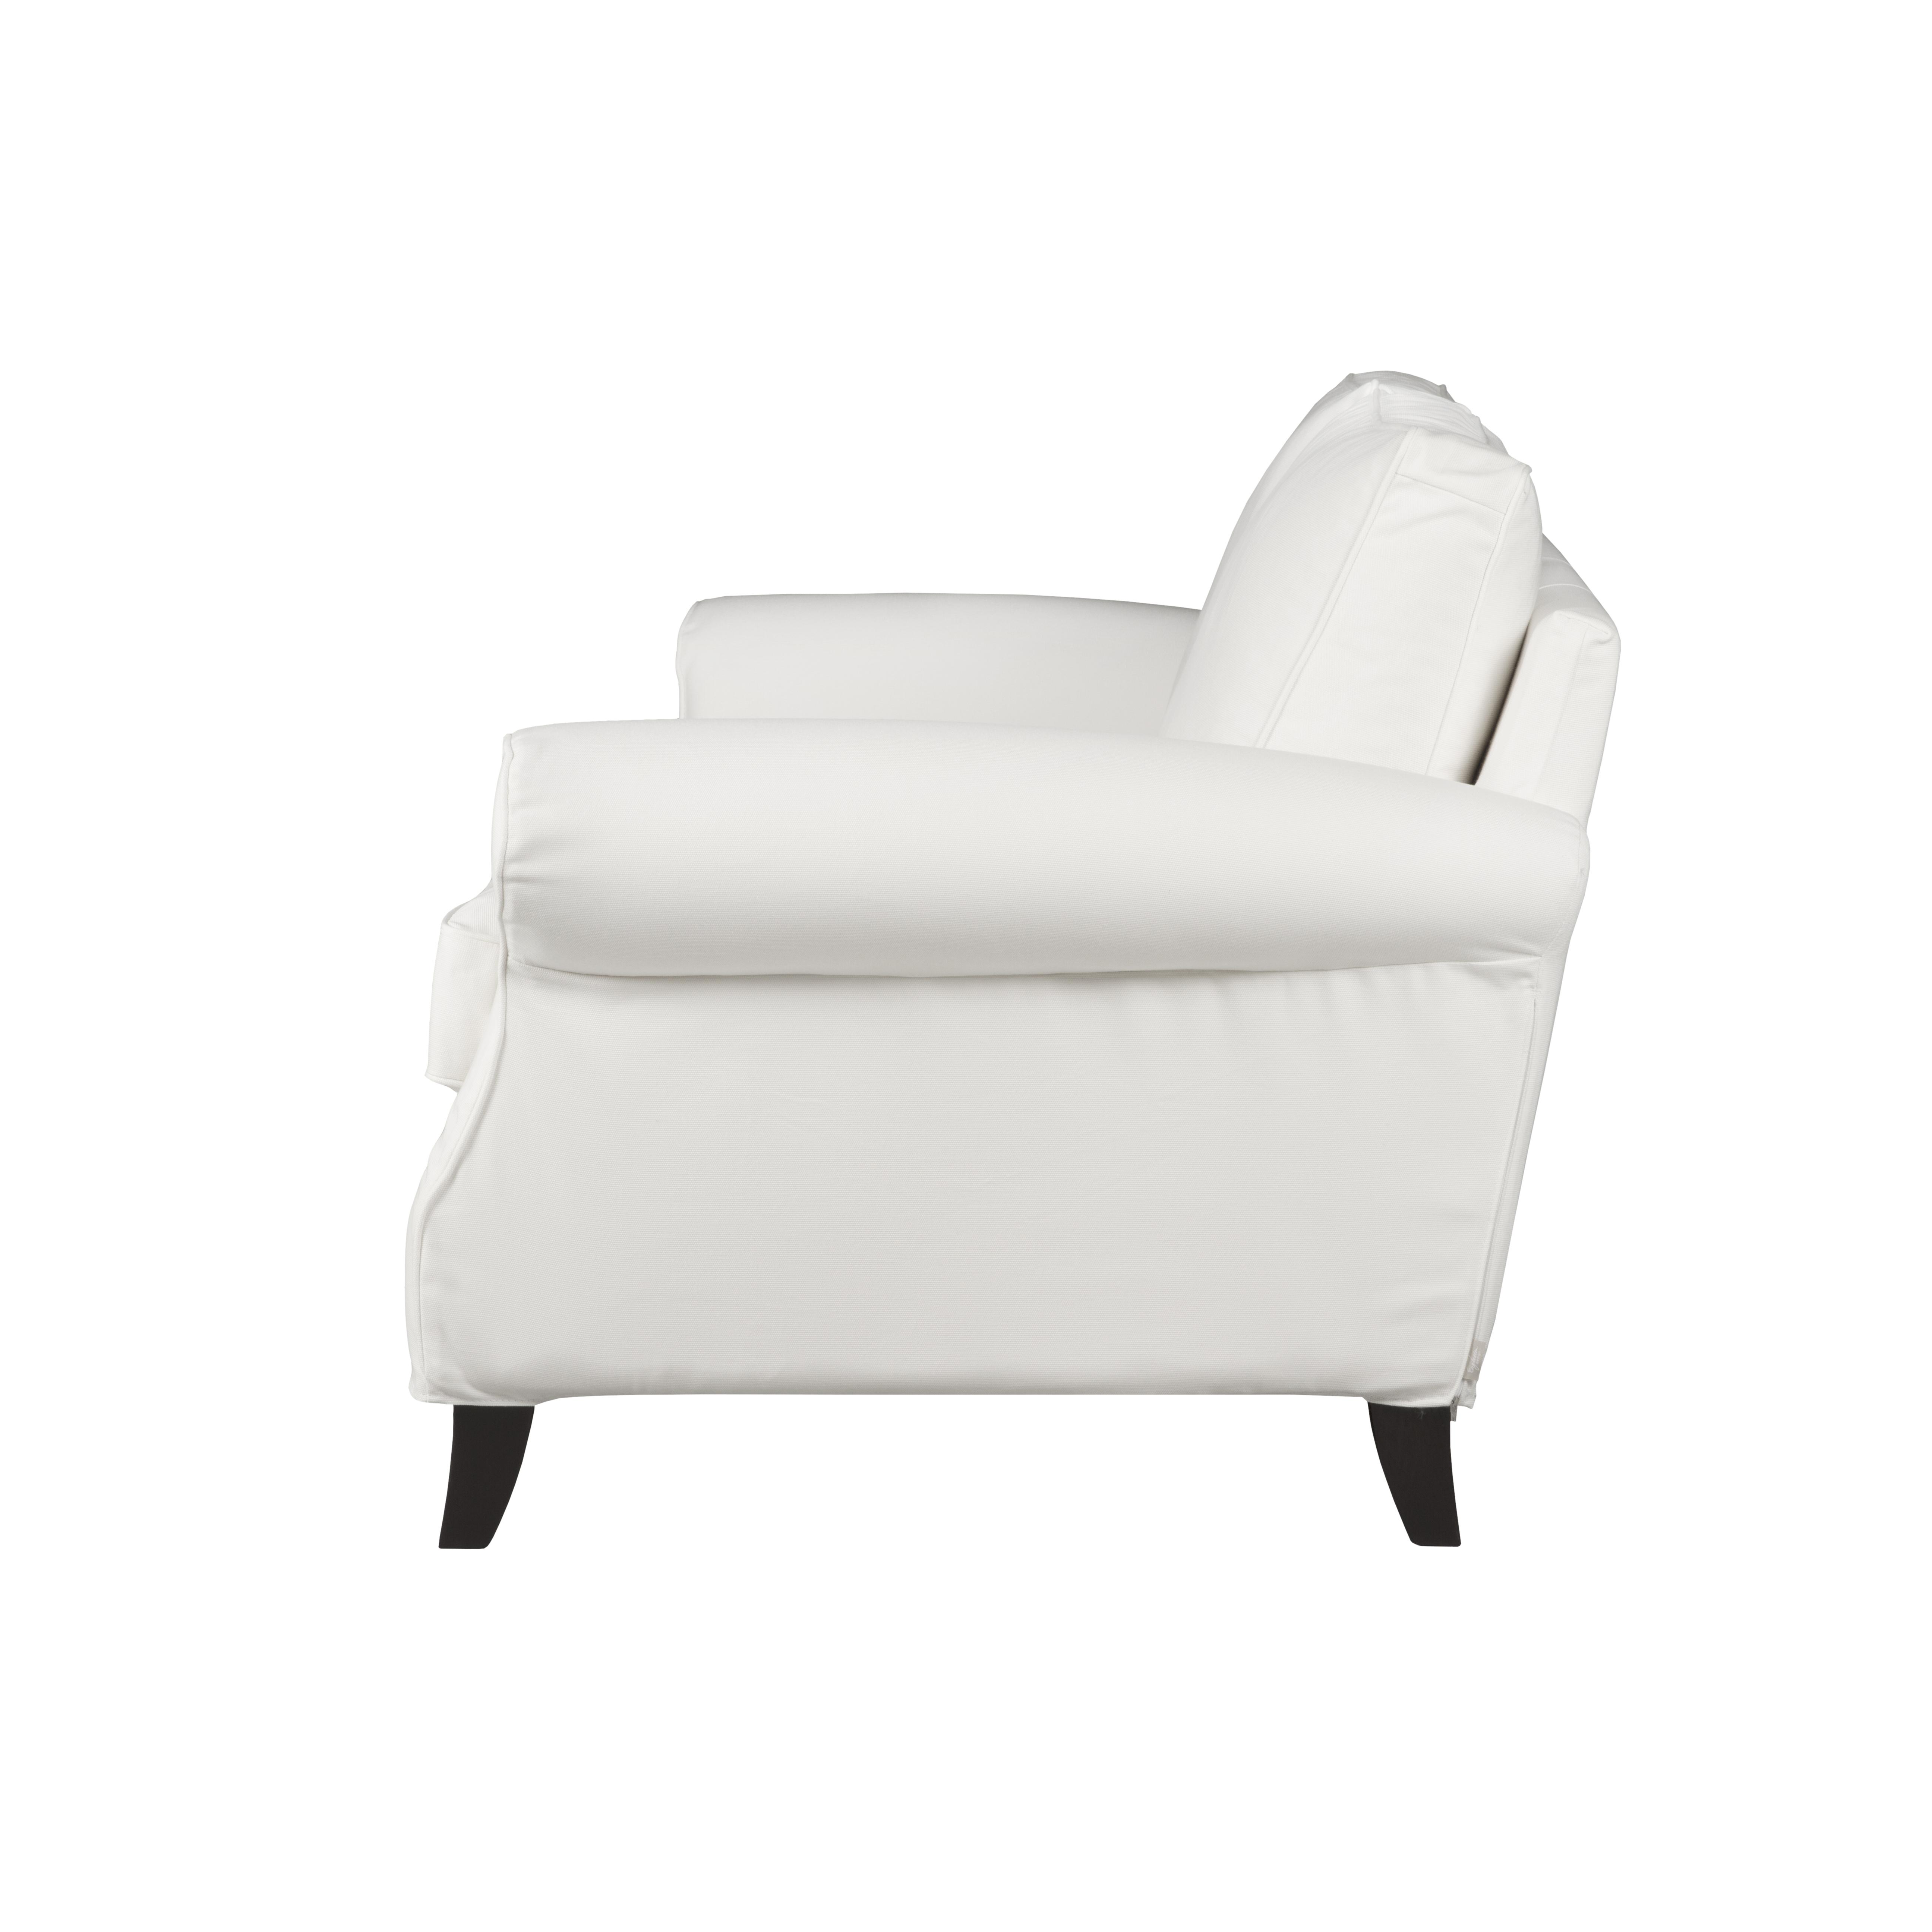 Djursholm soffa 3-sits från sidan - englesson.se